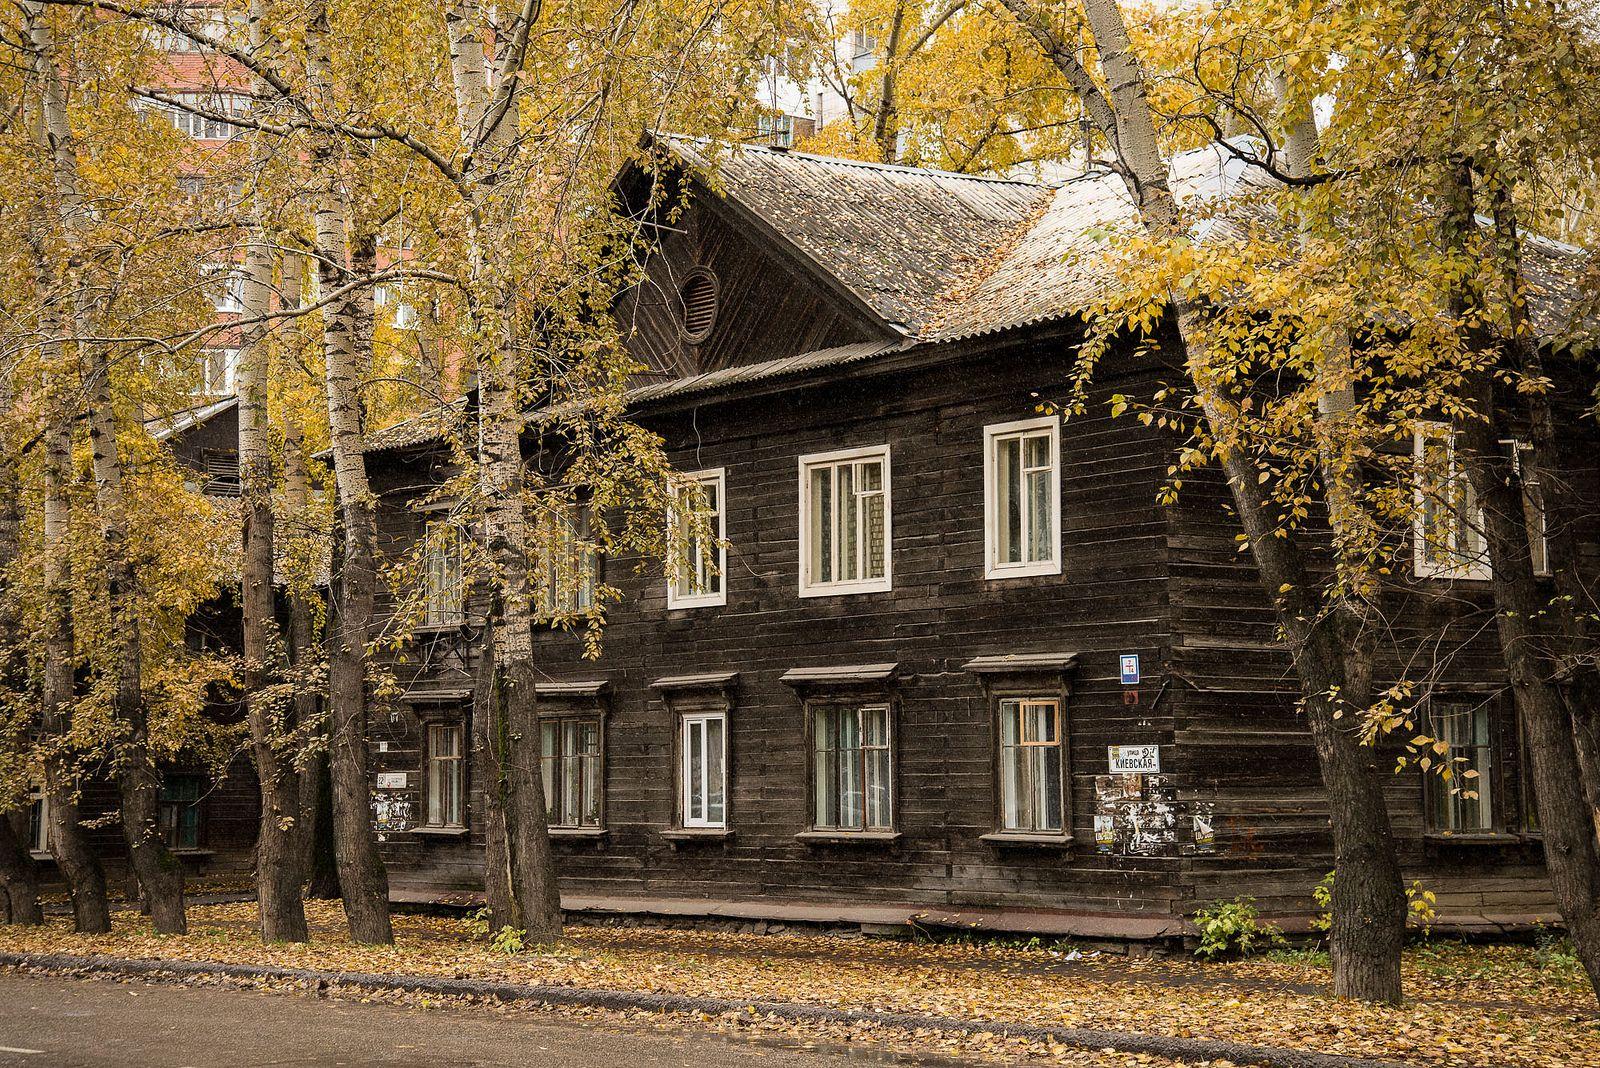 Wooden house / Tomsk / Siberia / 04.10.2013